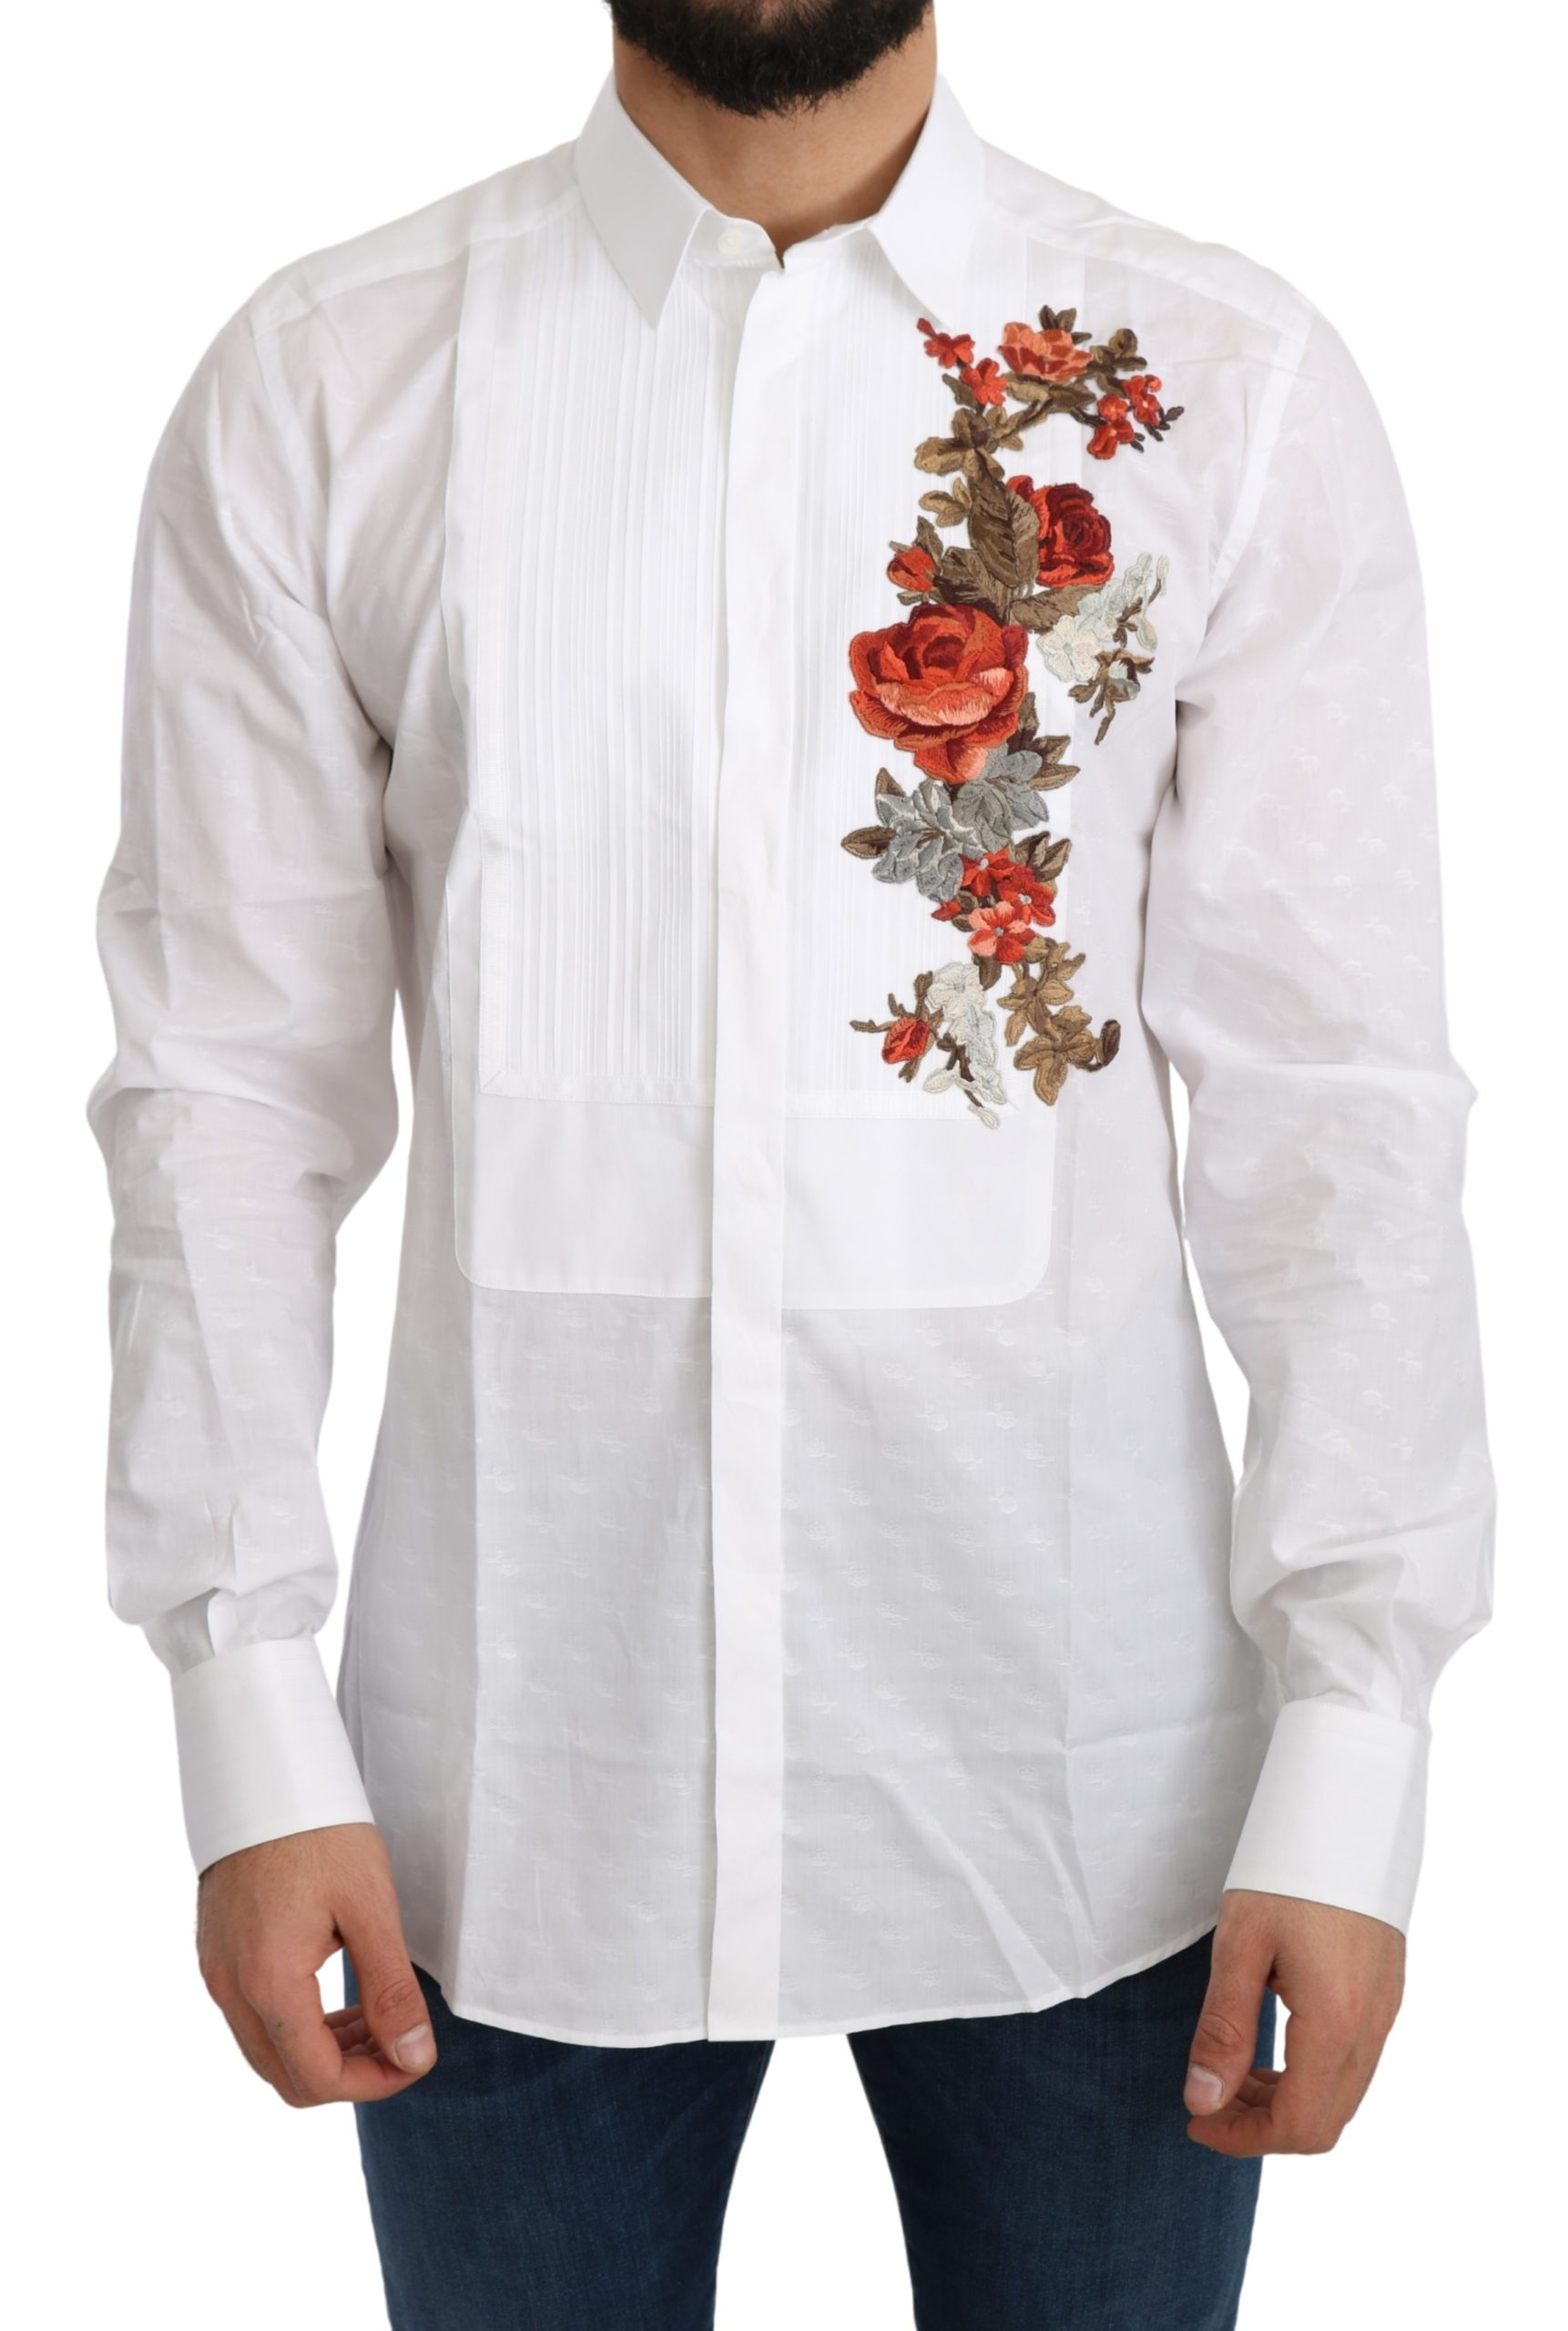 Dolce & Gabbana Men's Cotton GOLD Flowers Top Solid Shirt White TSH5217 - IT38   XS